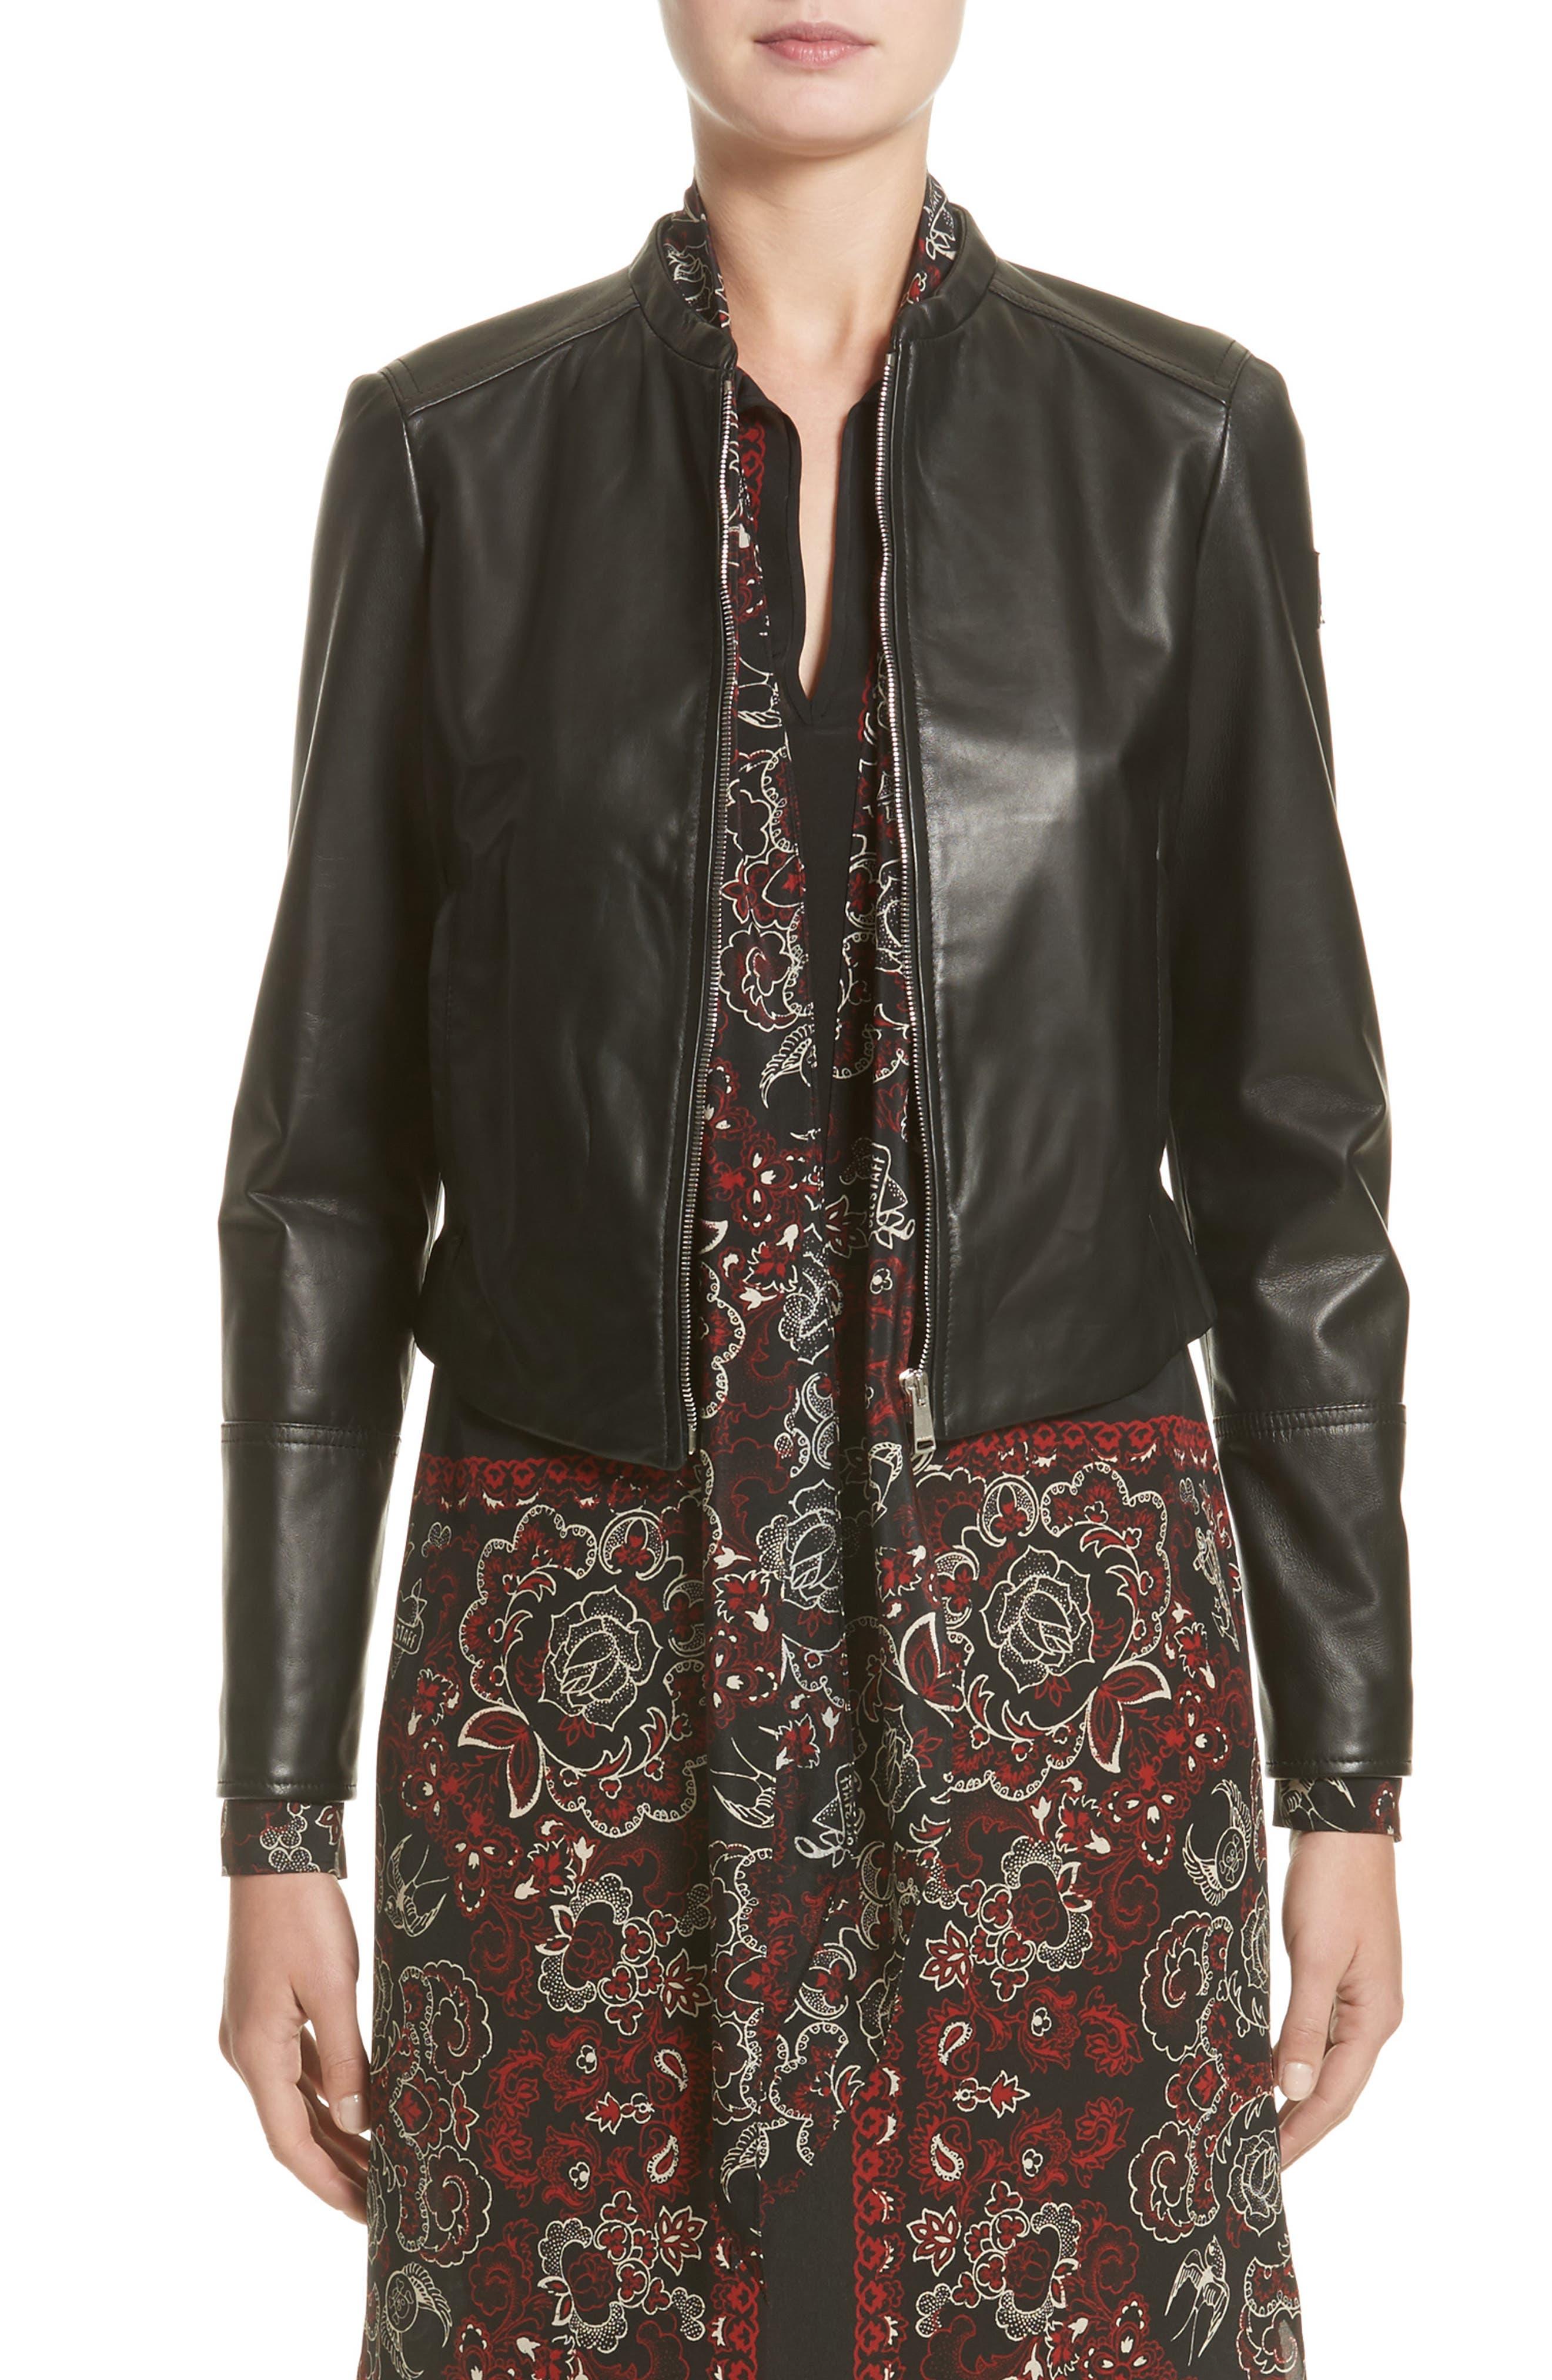 Carrack Leather Jacket,                             Main thumbnail 1, color,                             001